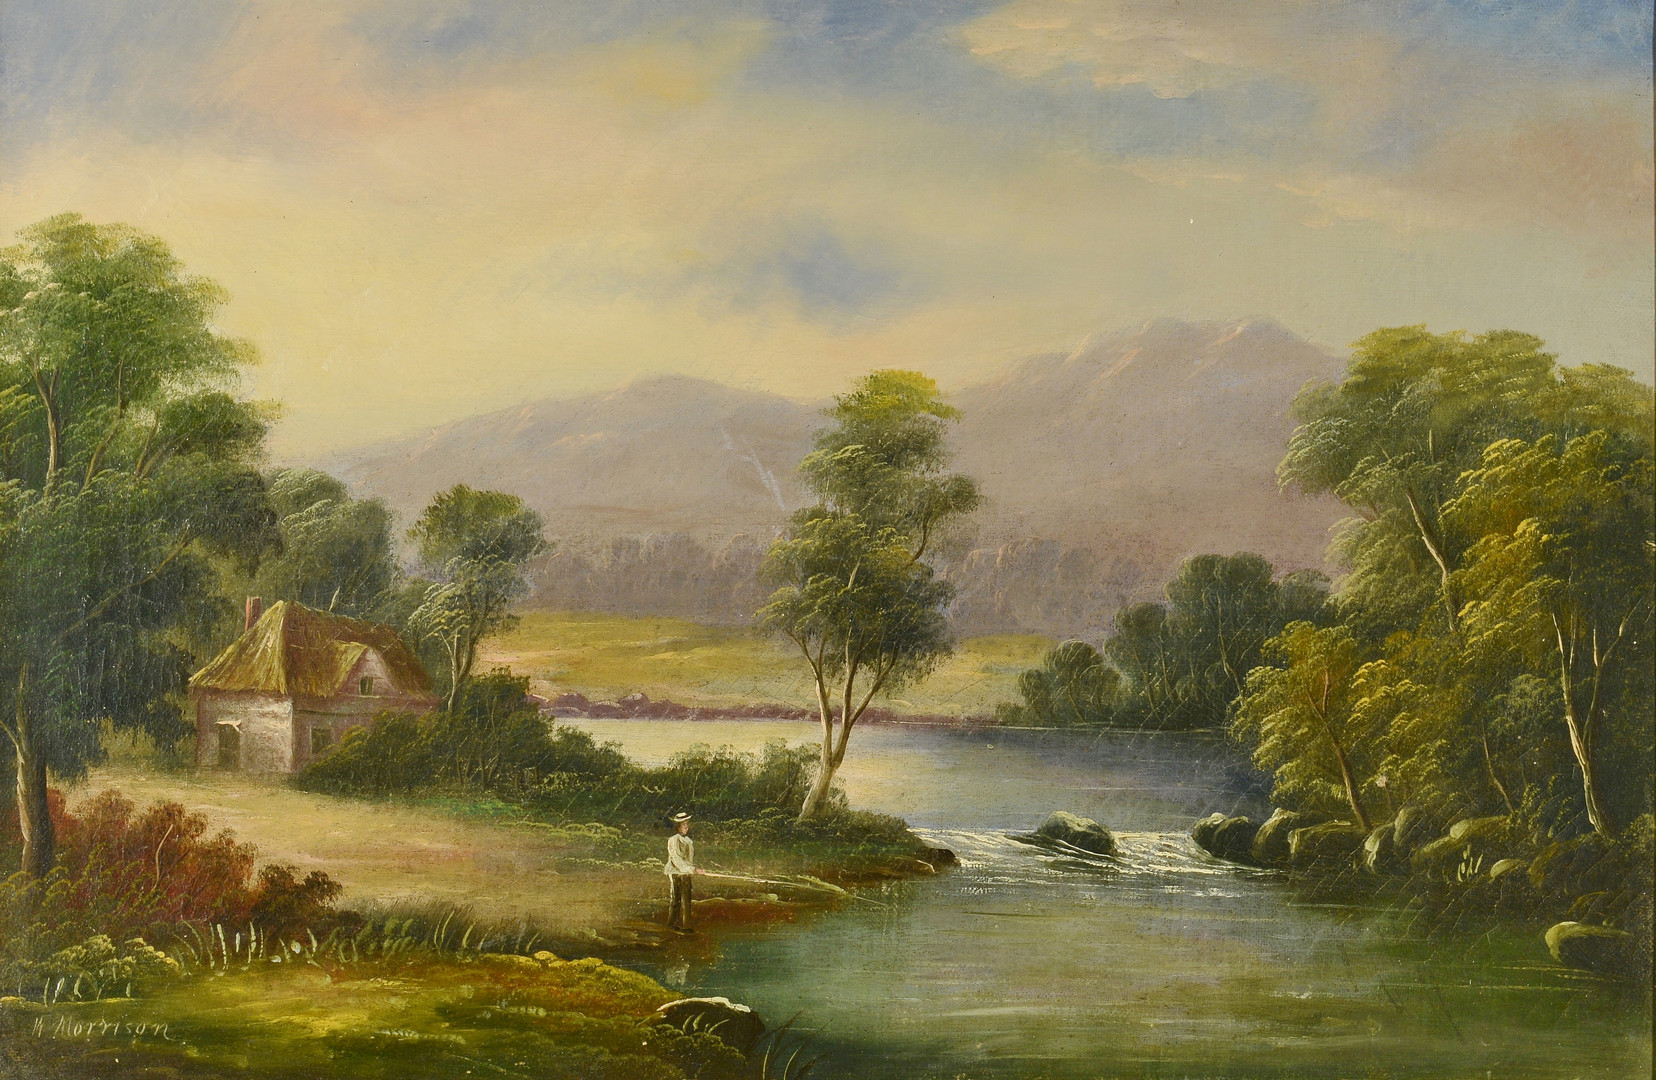 Lot 458: Attr. W. Morrison, landscape oil with fisherman